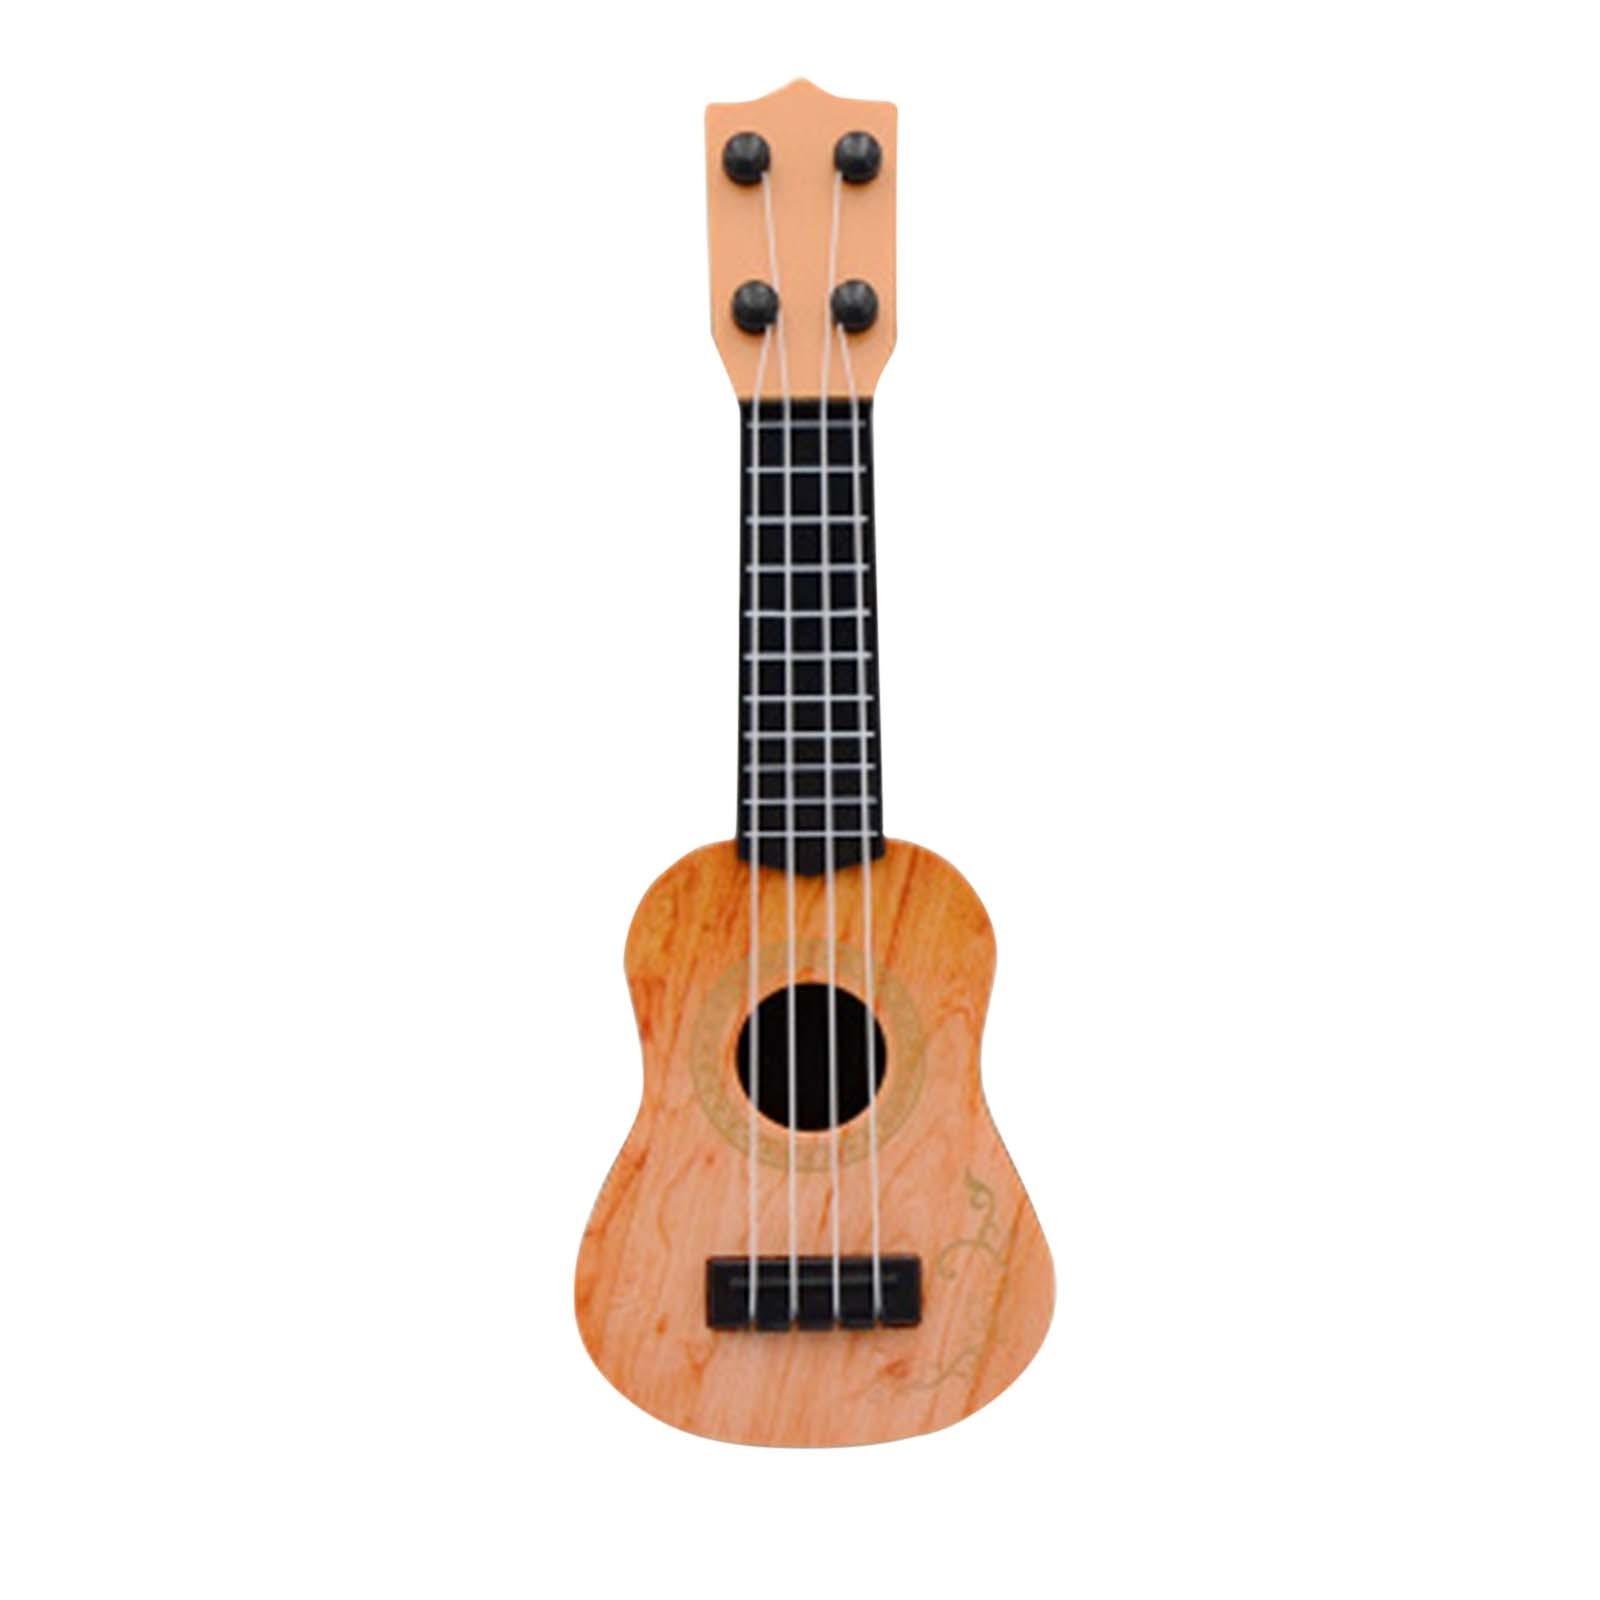 Hot kids toy ukulele guitar musical instrument suitable for kids ukulele music toys for beginners and kids enlarge